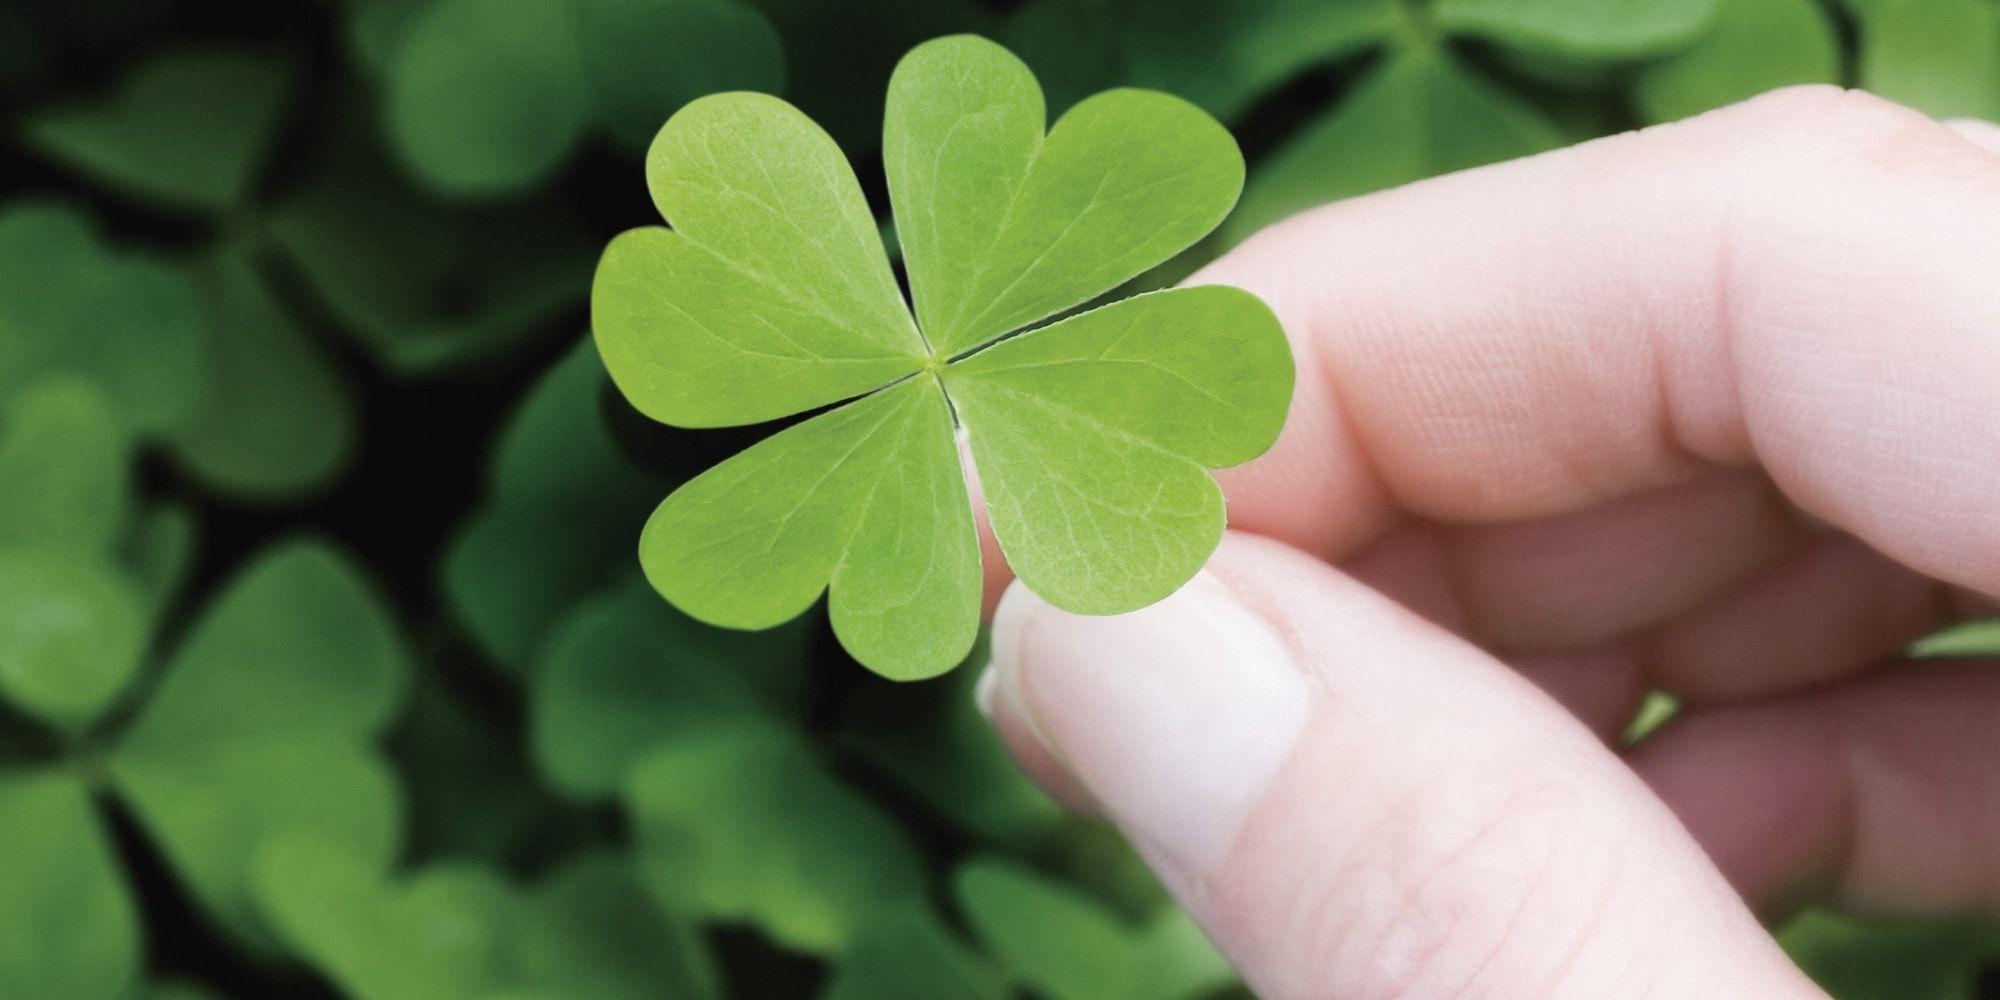 Are You Gambling When Starting A Business How Much Luck Do You Need Gamblers United Hoja De Trébol Treboles 4 Hojas Trebol